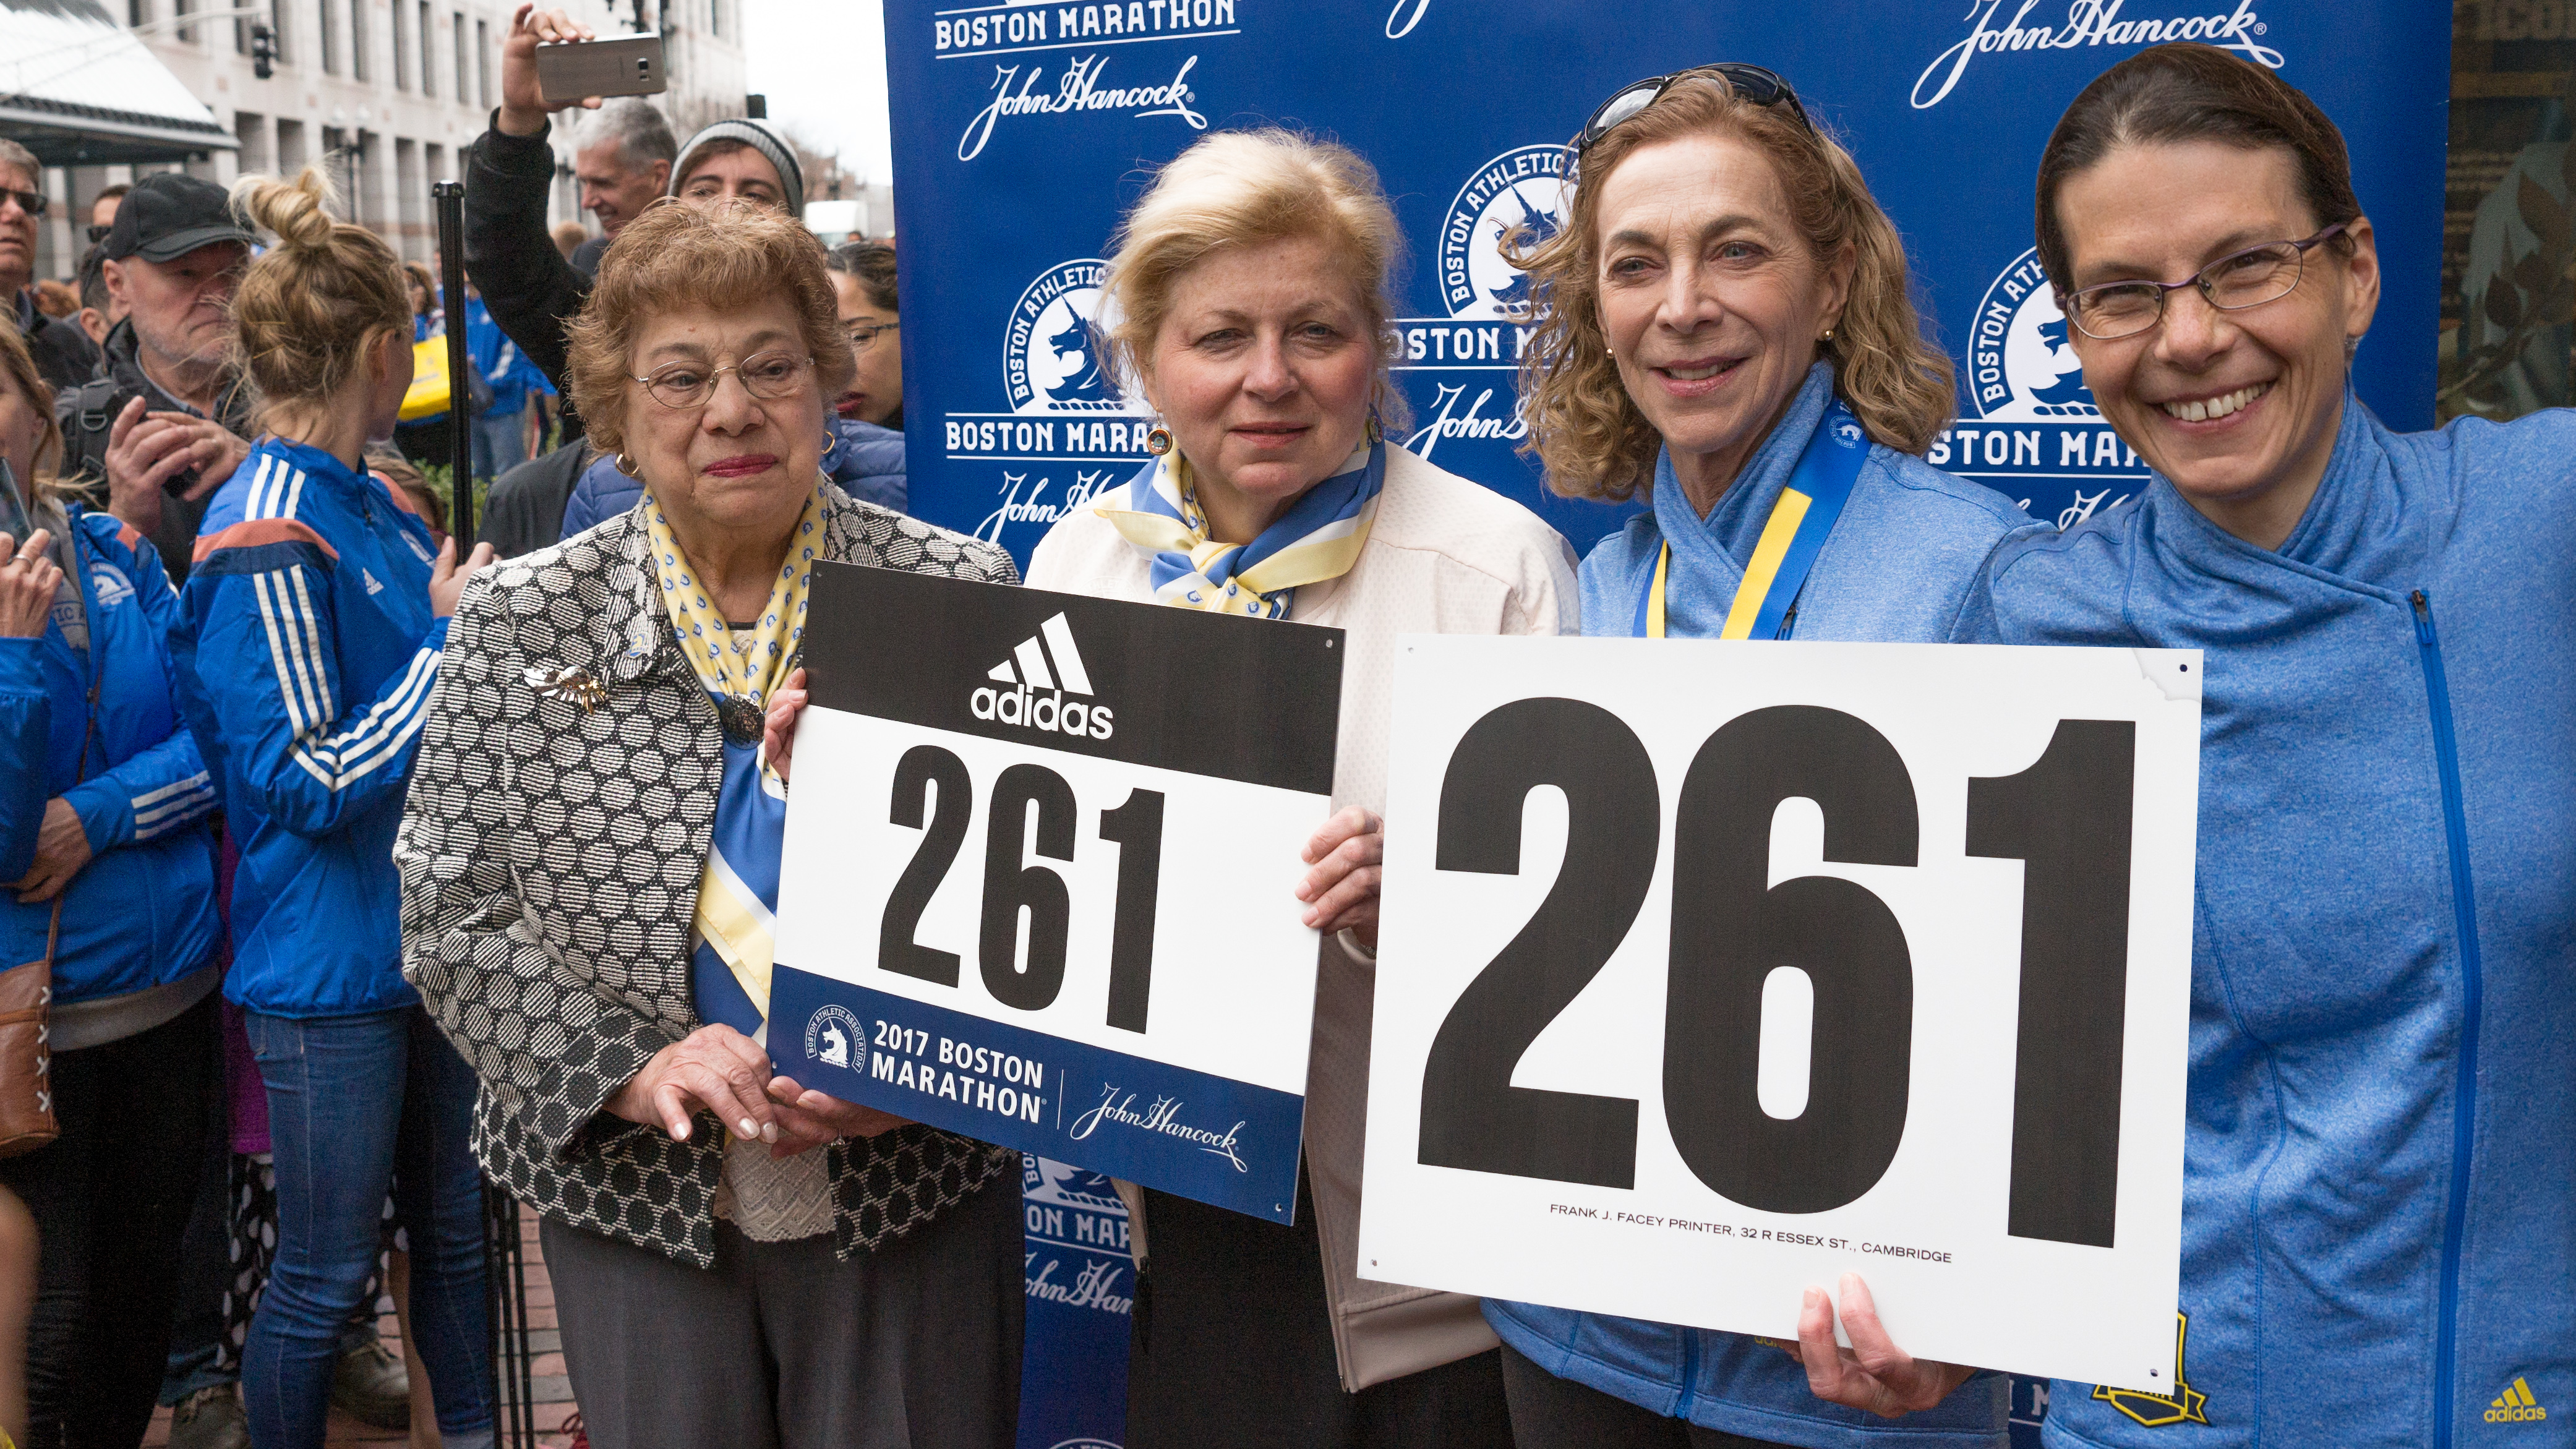 261 Fearless at the marathon